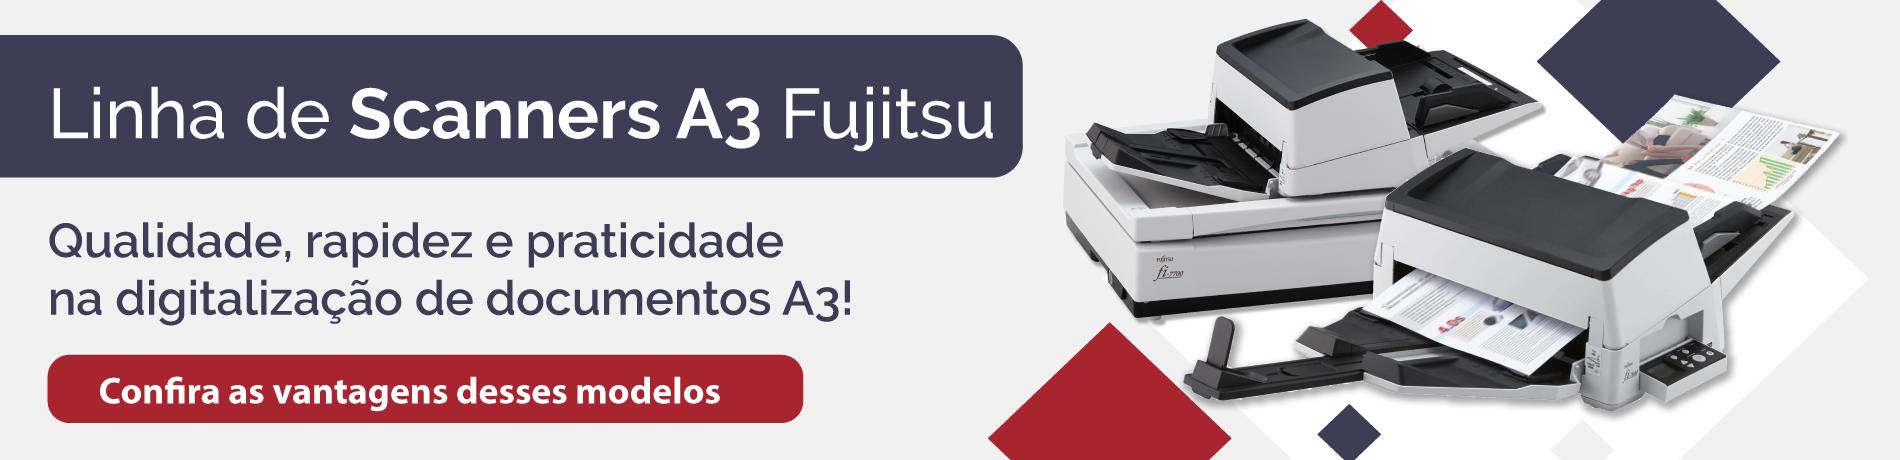 Banner linha de Scanners A3 Fujitsu